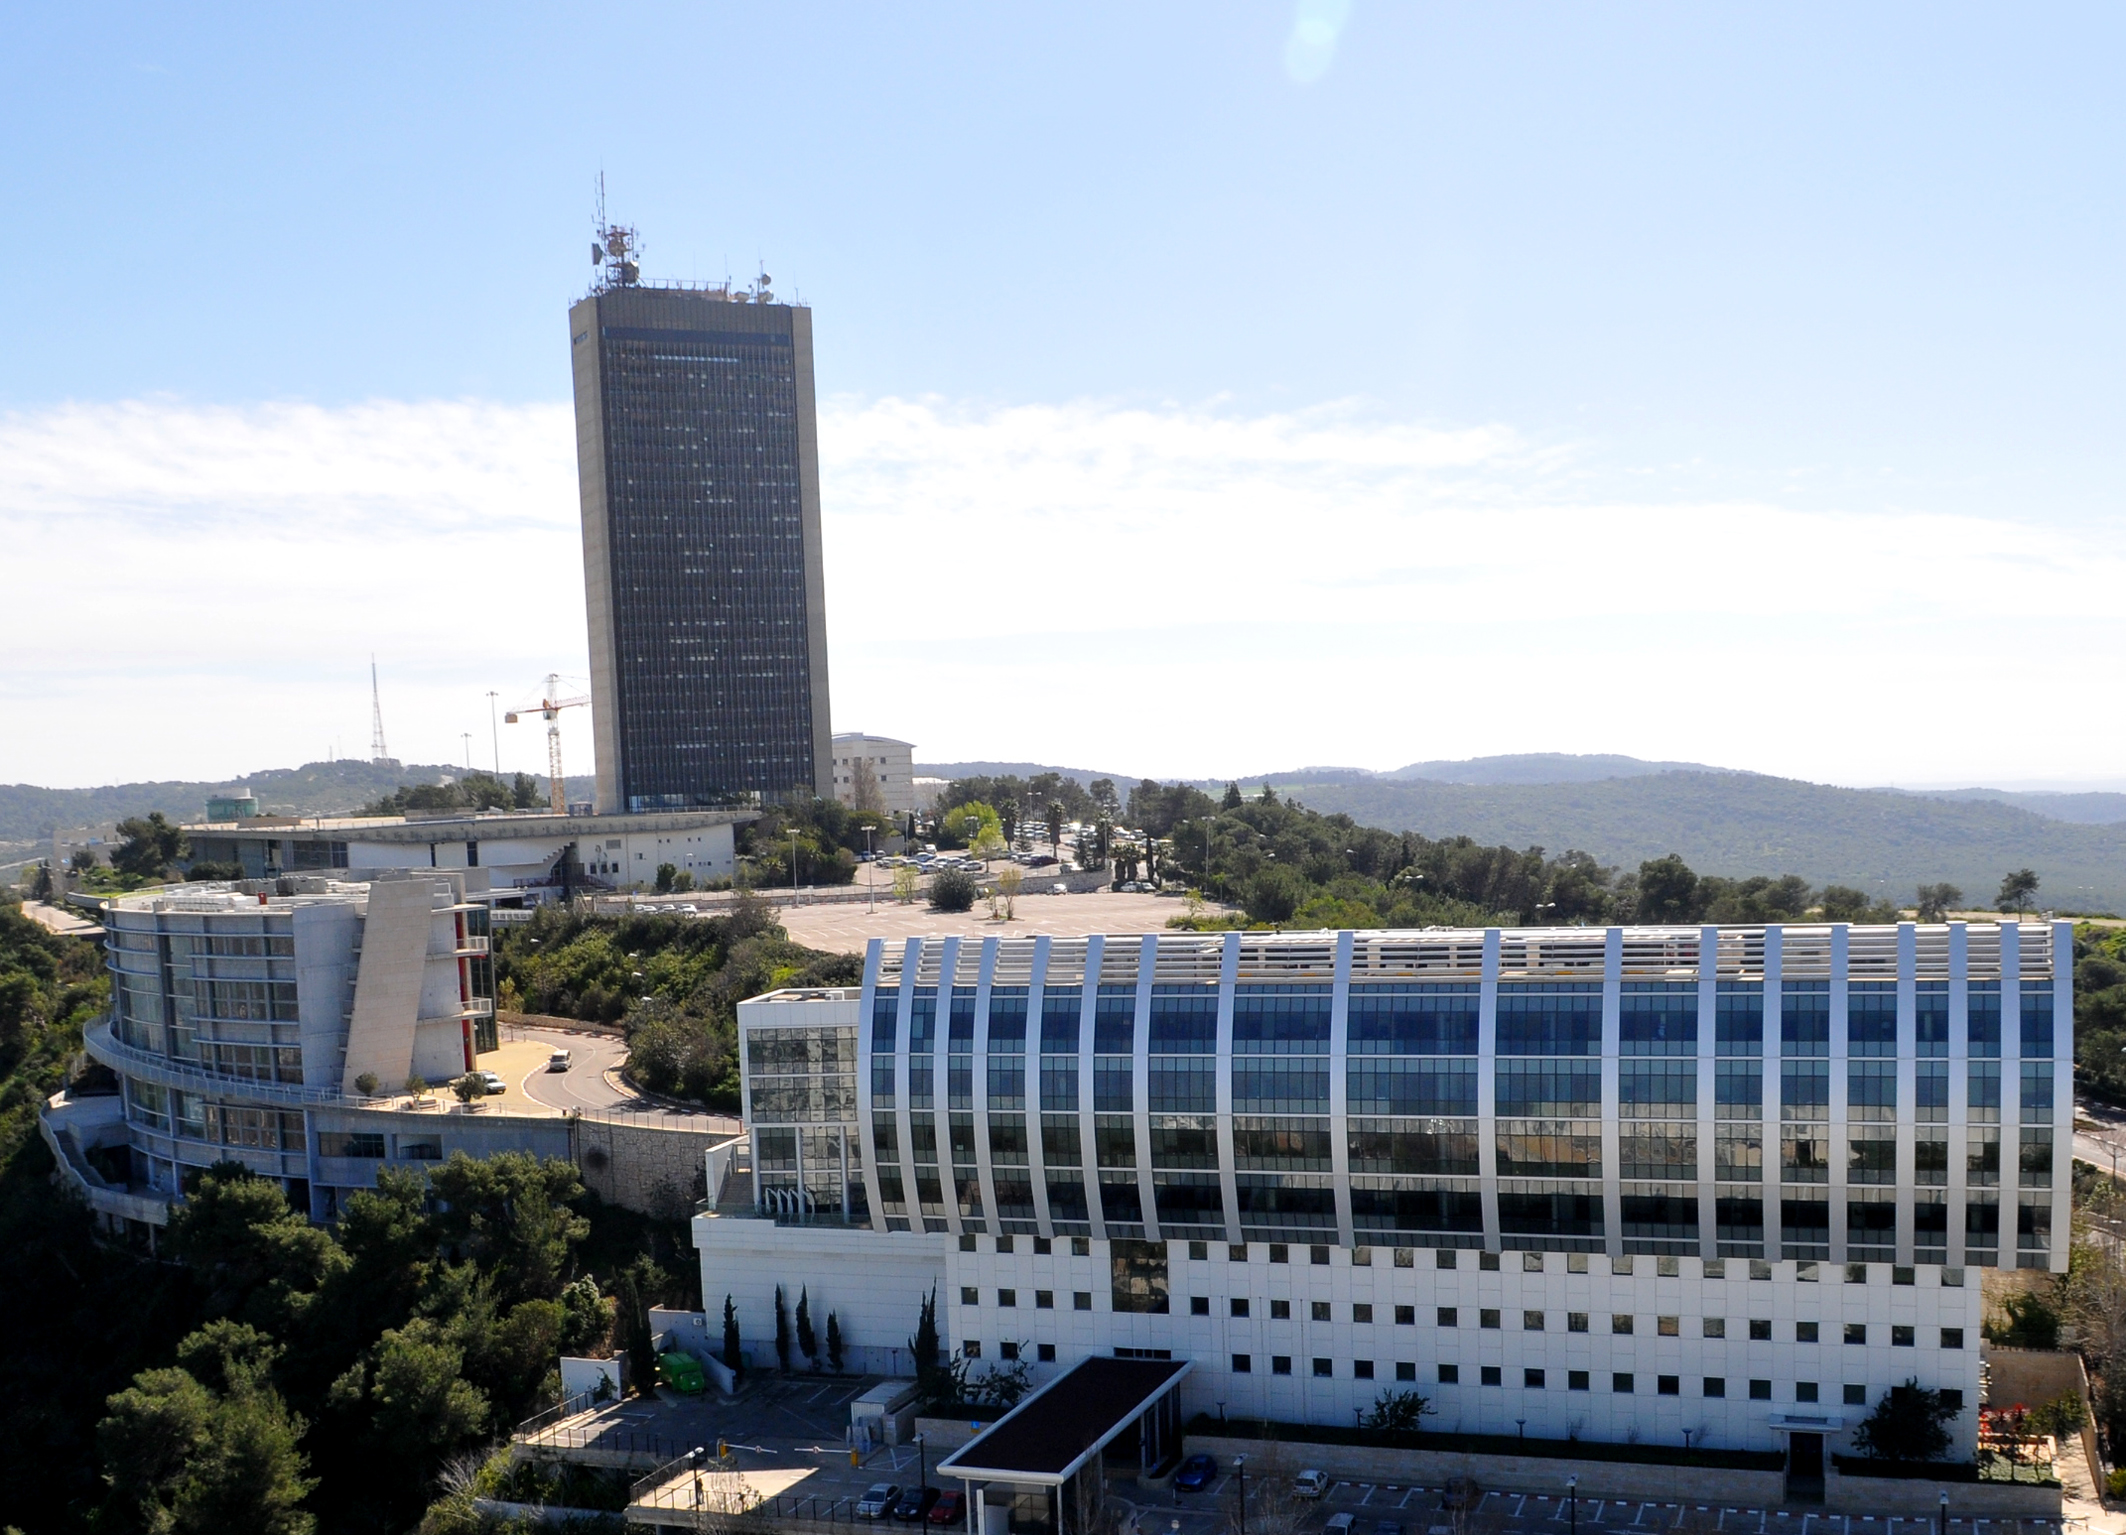 Startup Nation To Revitalize Entrepreneurship Innovation On University Campuses